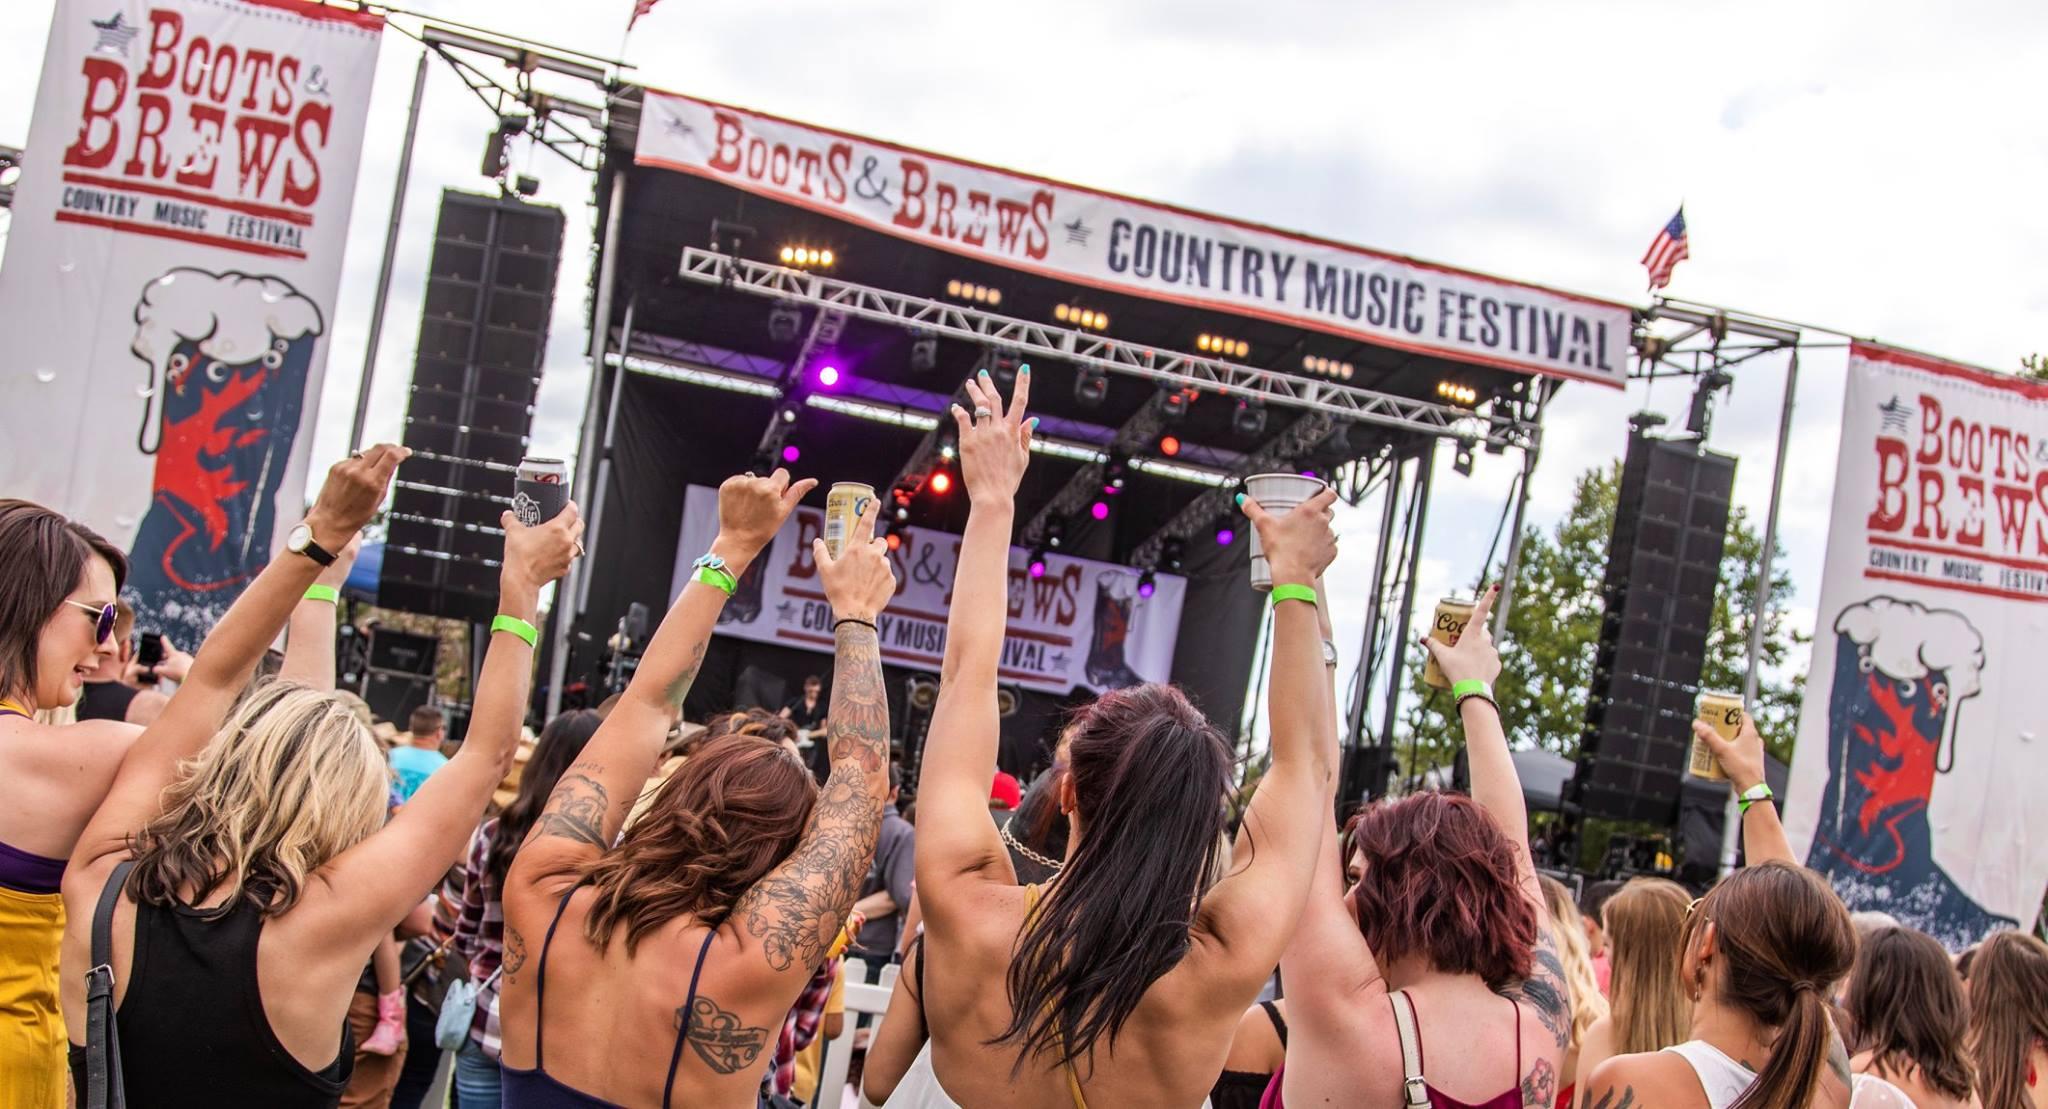 Boots & Brews Country Music Festival - Santa Clarita